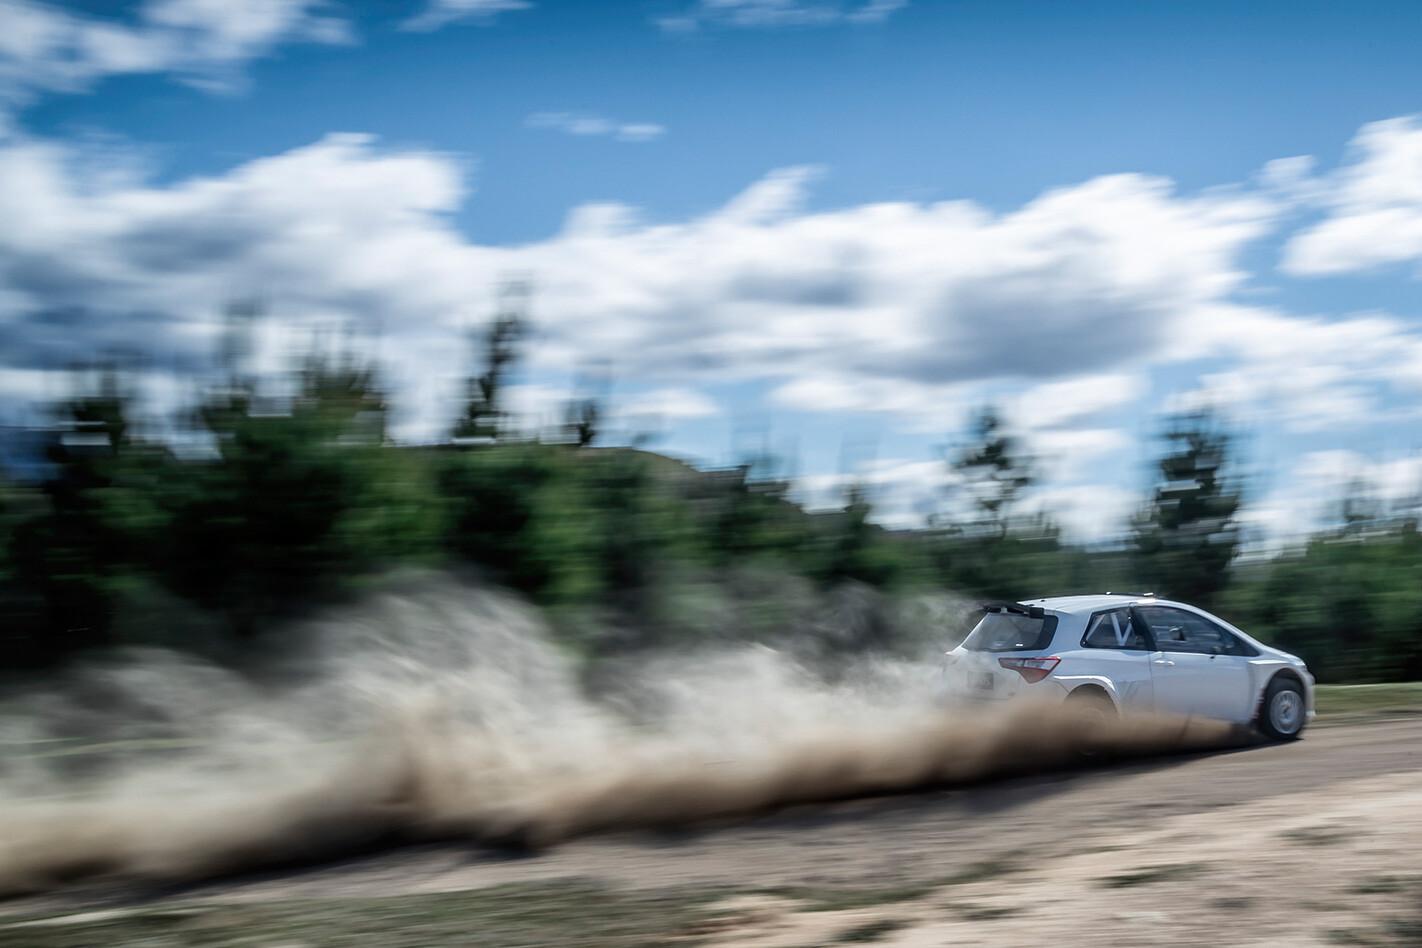 Toyota-Yaris-AP4-rally-car-dirt-road-driving.jpg